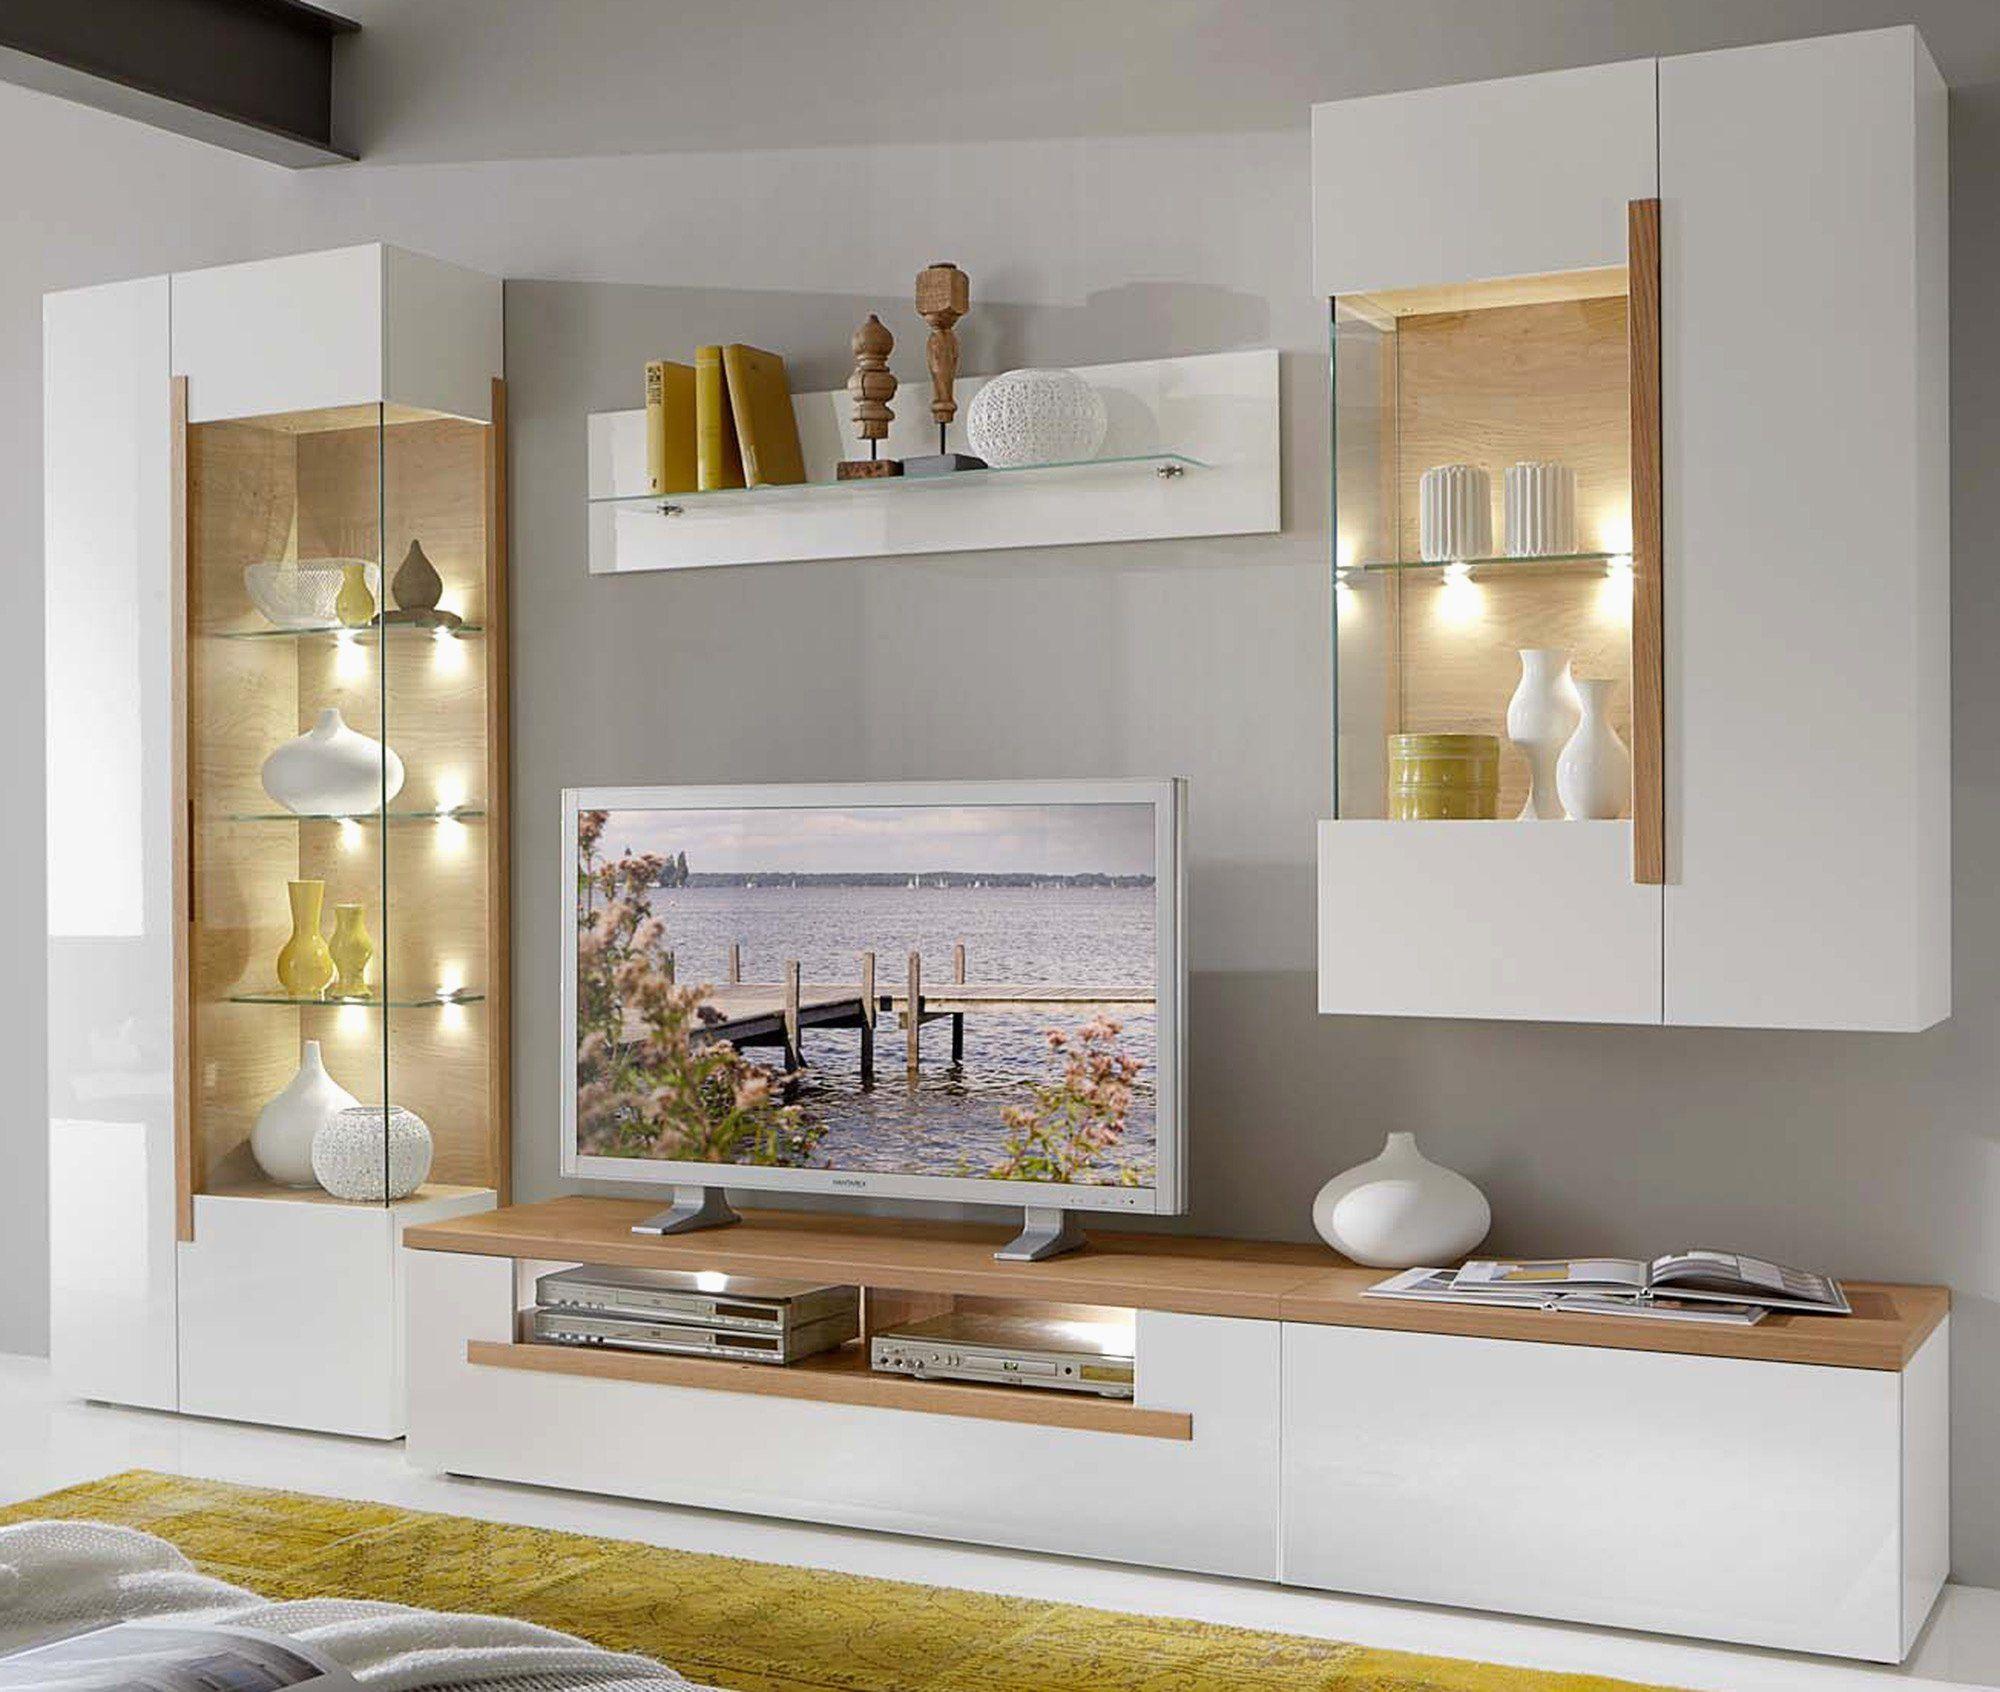 13 Klassisch Kollektion Von Wohnzimmerschrank Holz Modern   Cheap living room sets, Living room ...